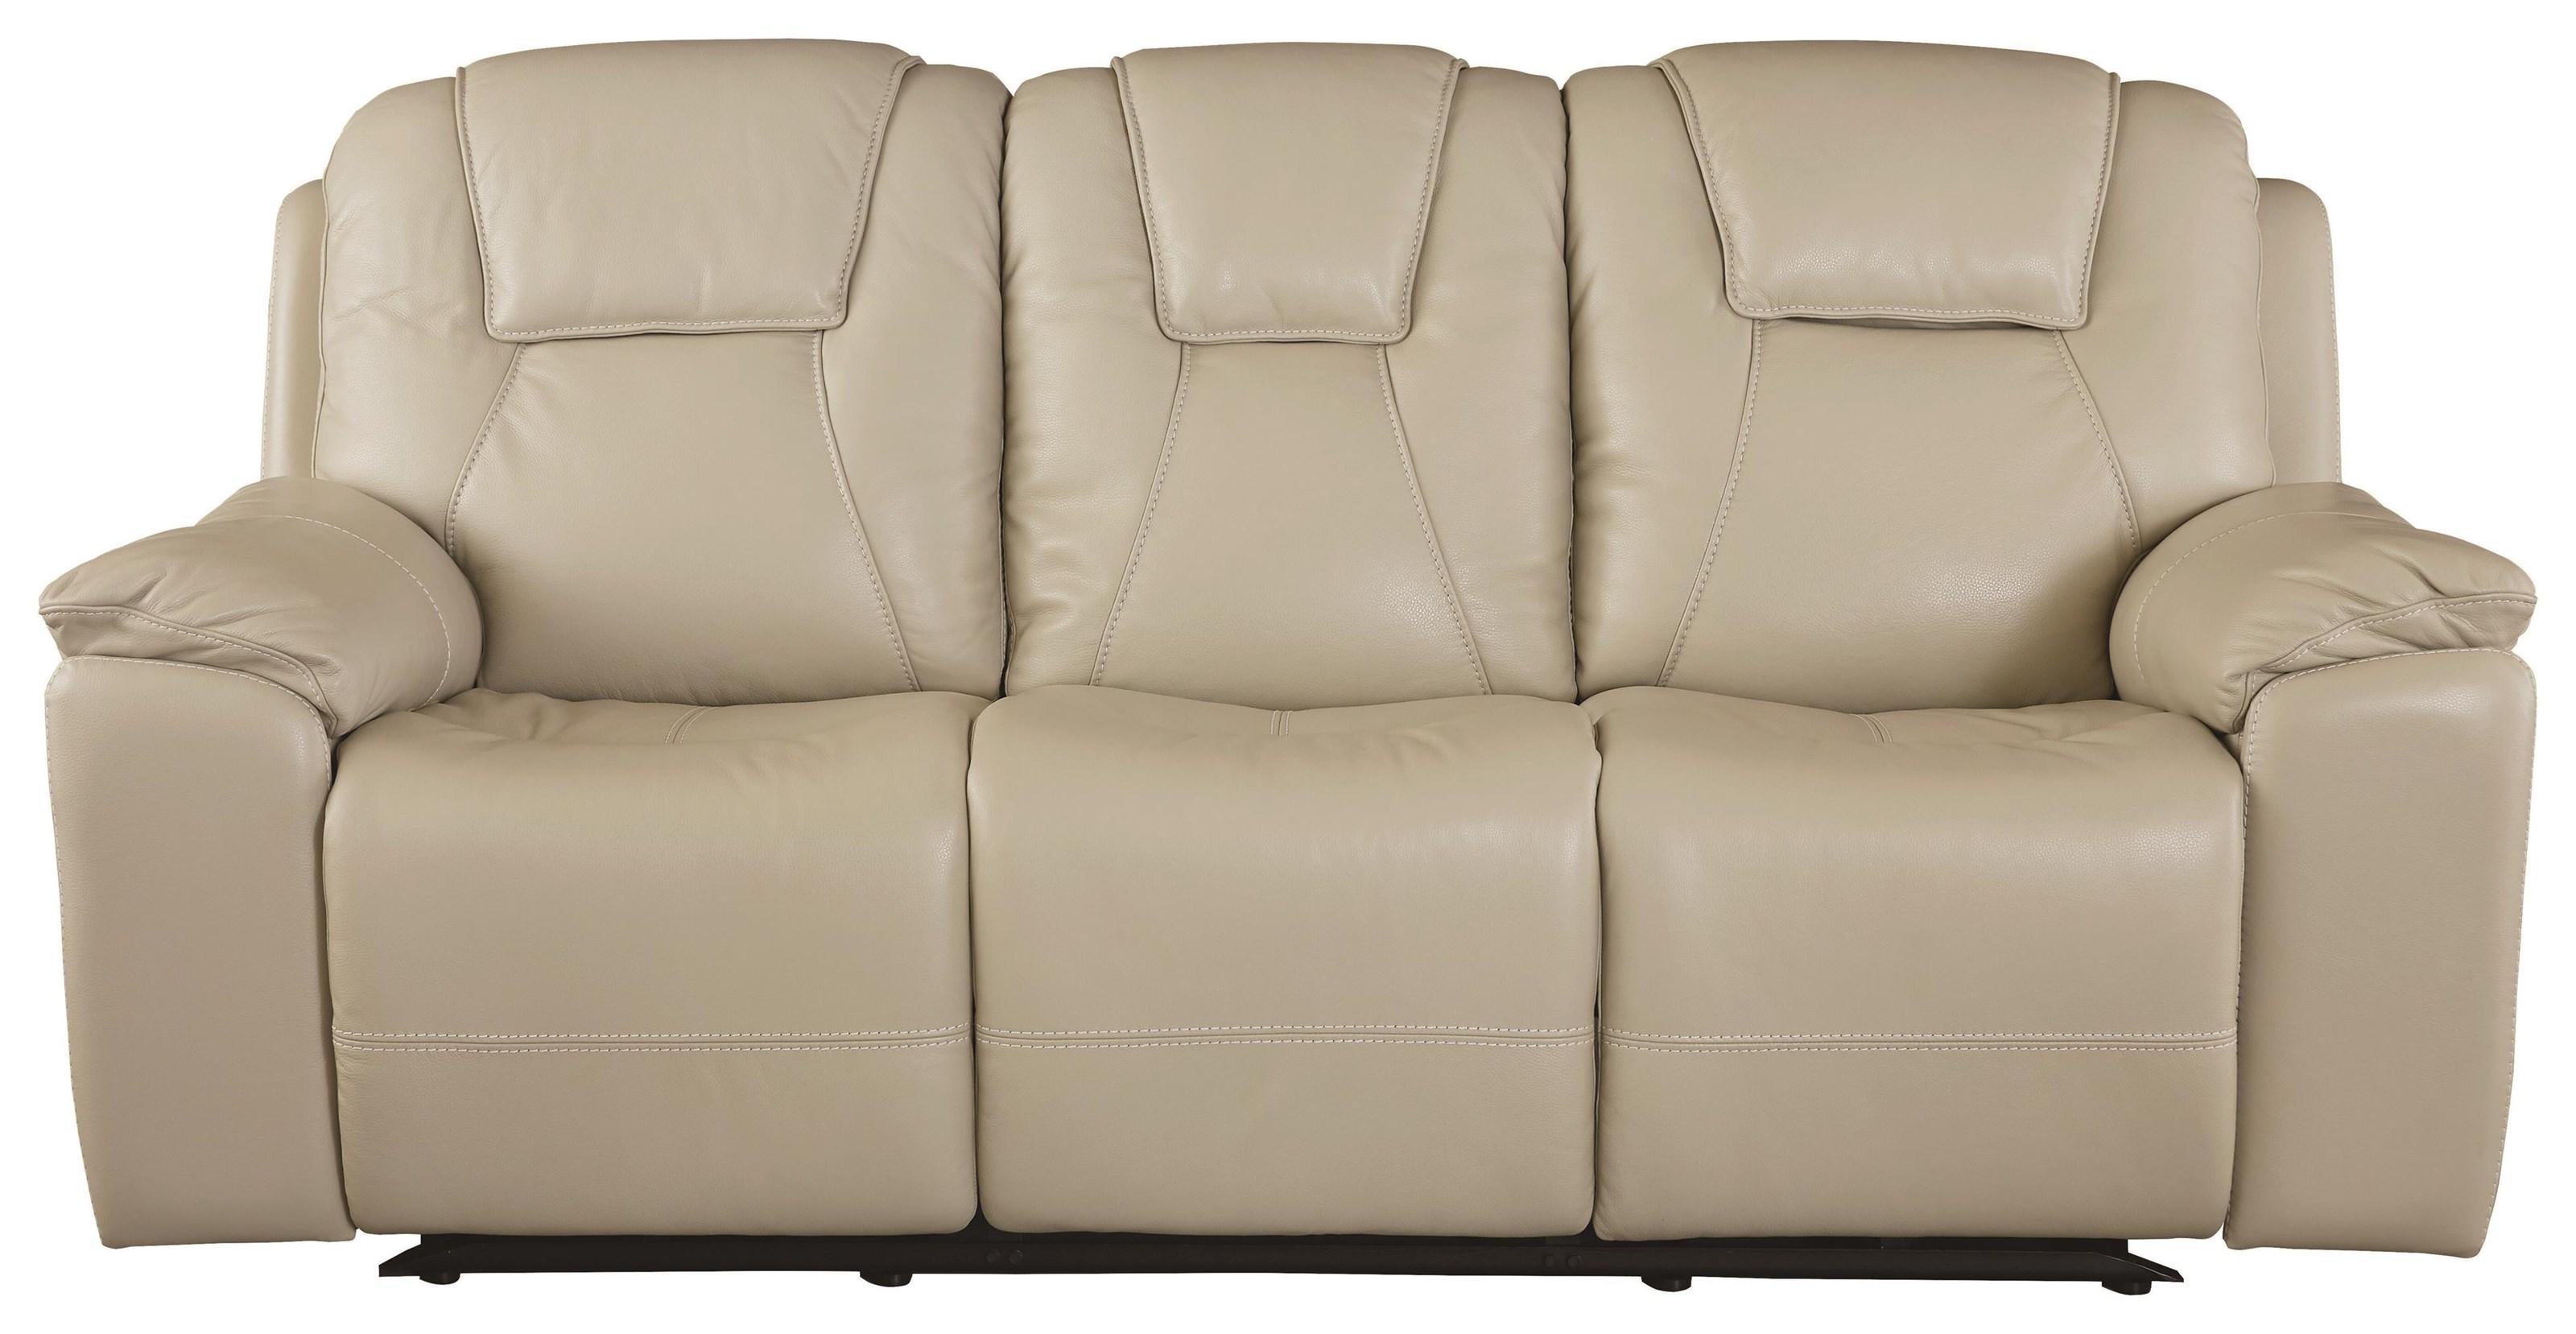 Club Level - Chandler Reclining Sofa by Bassett at Johnny Janosik